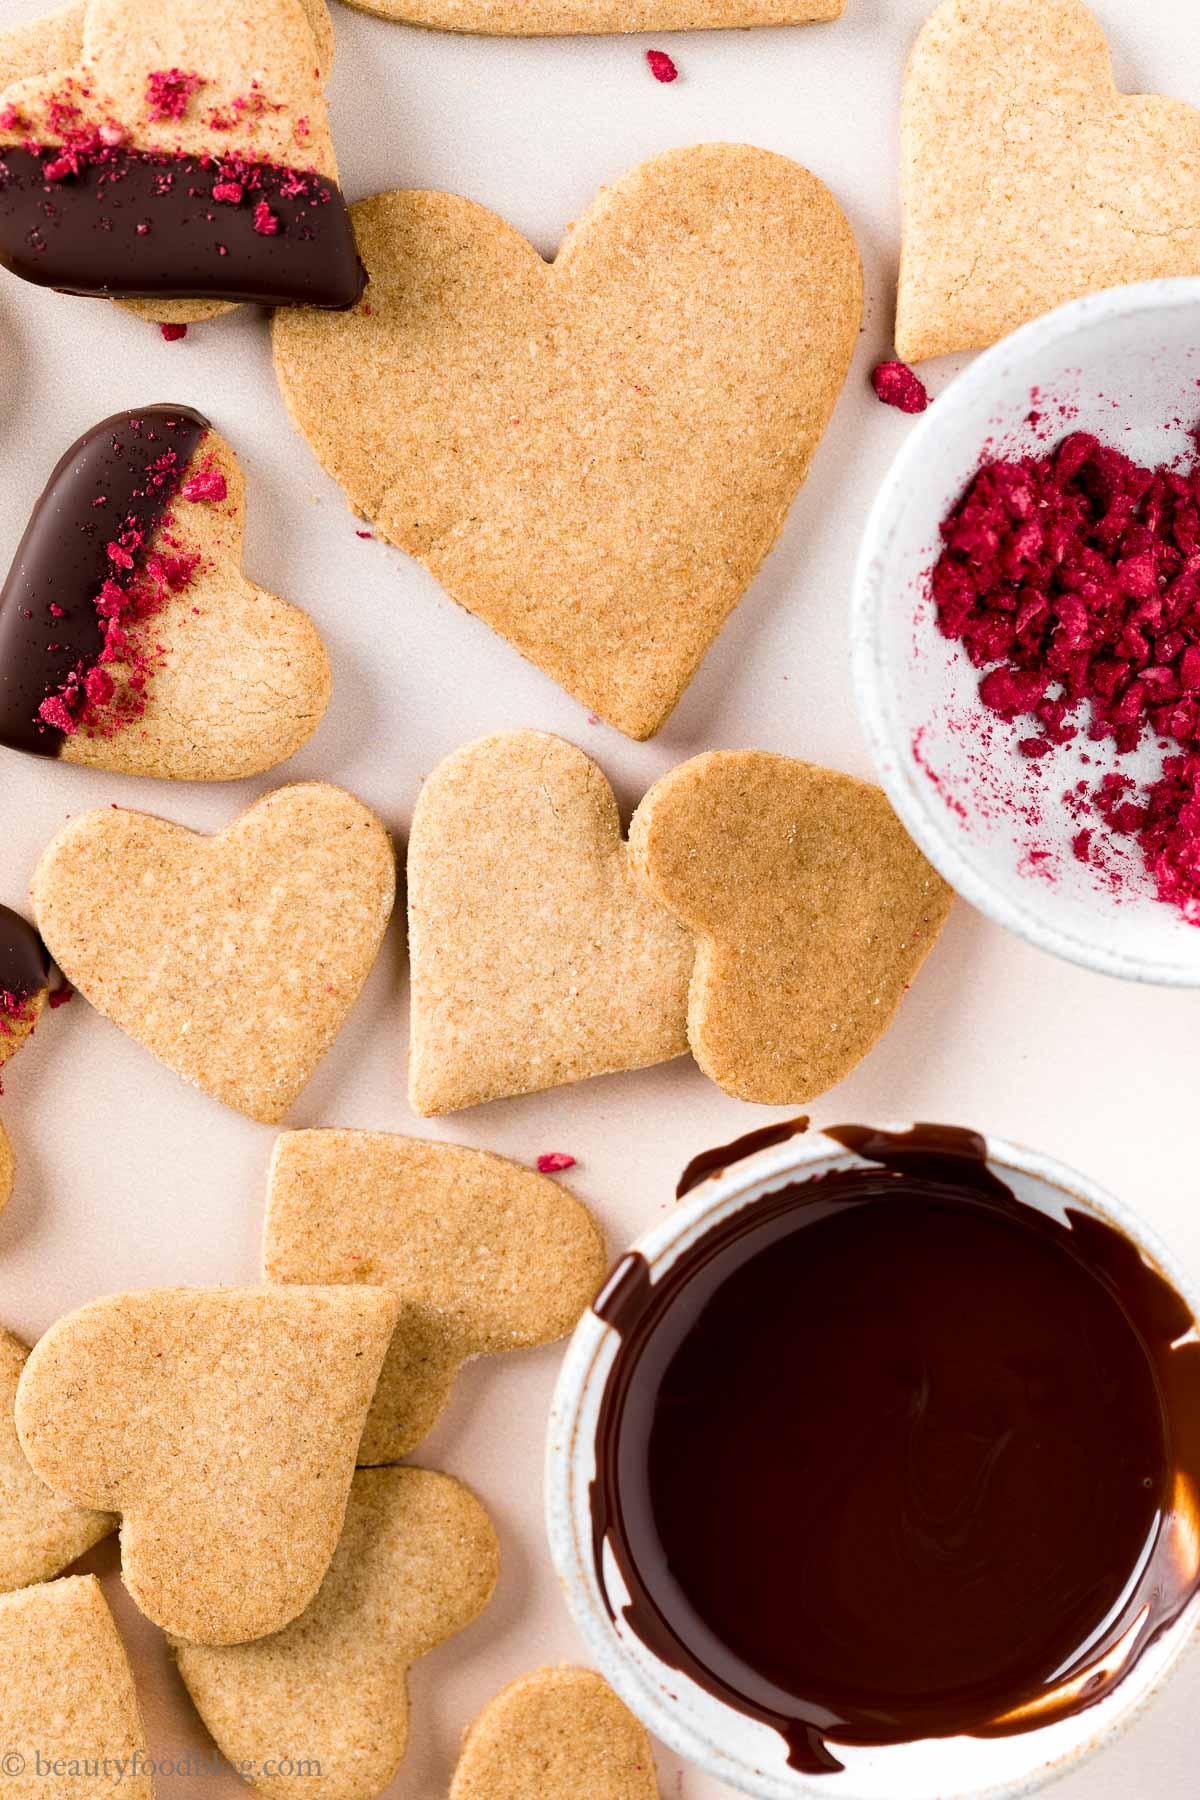 vegan Valentines Day vegan shortbread cookies ricetta frollini vegani biscotti di pasta frolla vegana integrale senza uova senza burro per San Valentino